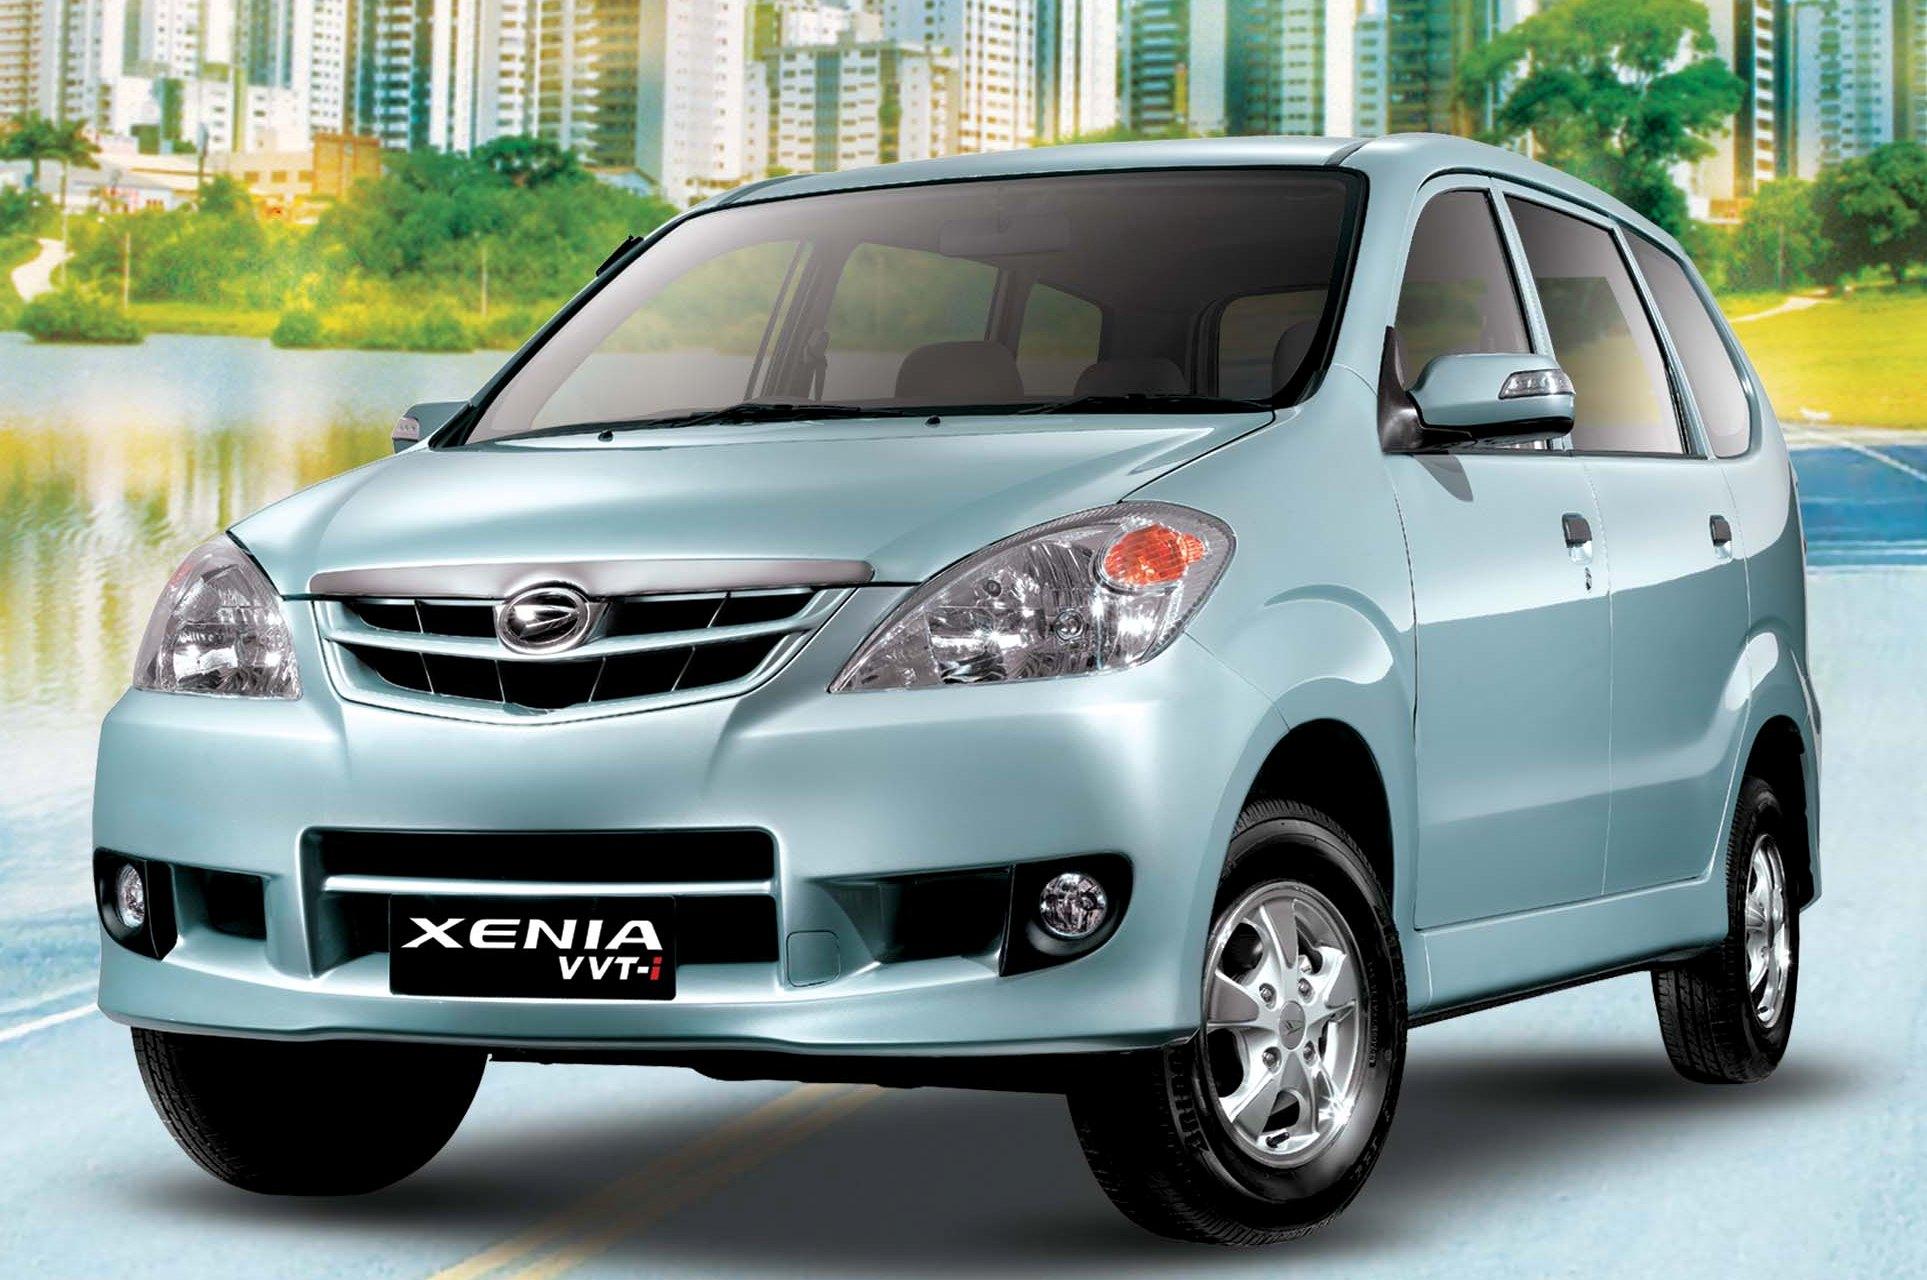 Daihatsu-Xenia-VVTi-I-Indonesia-1-